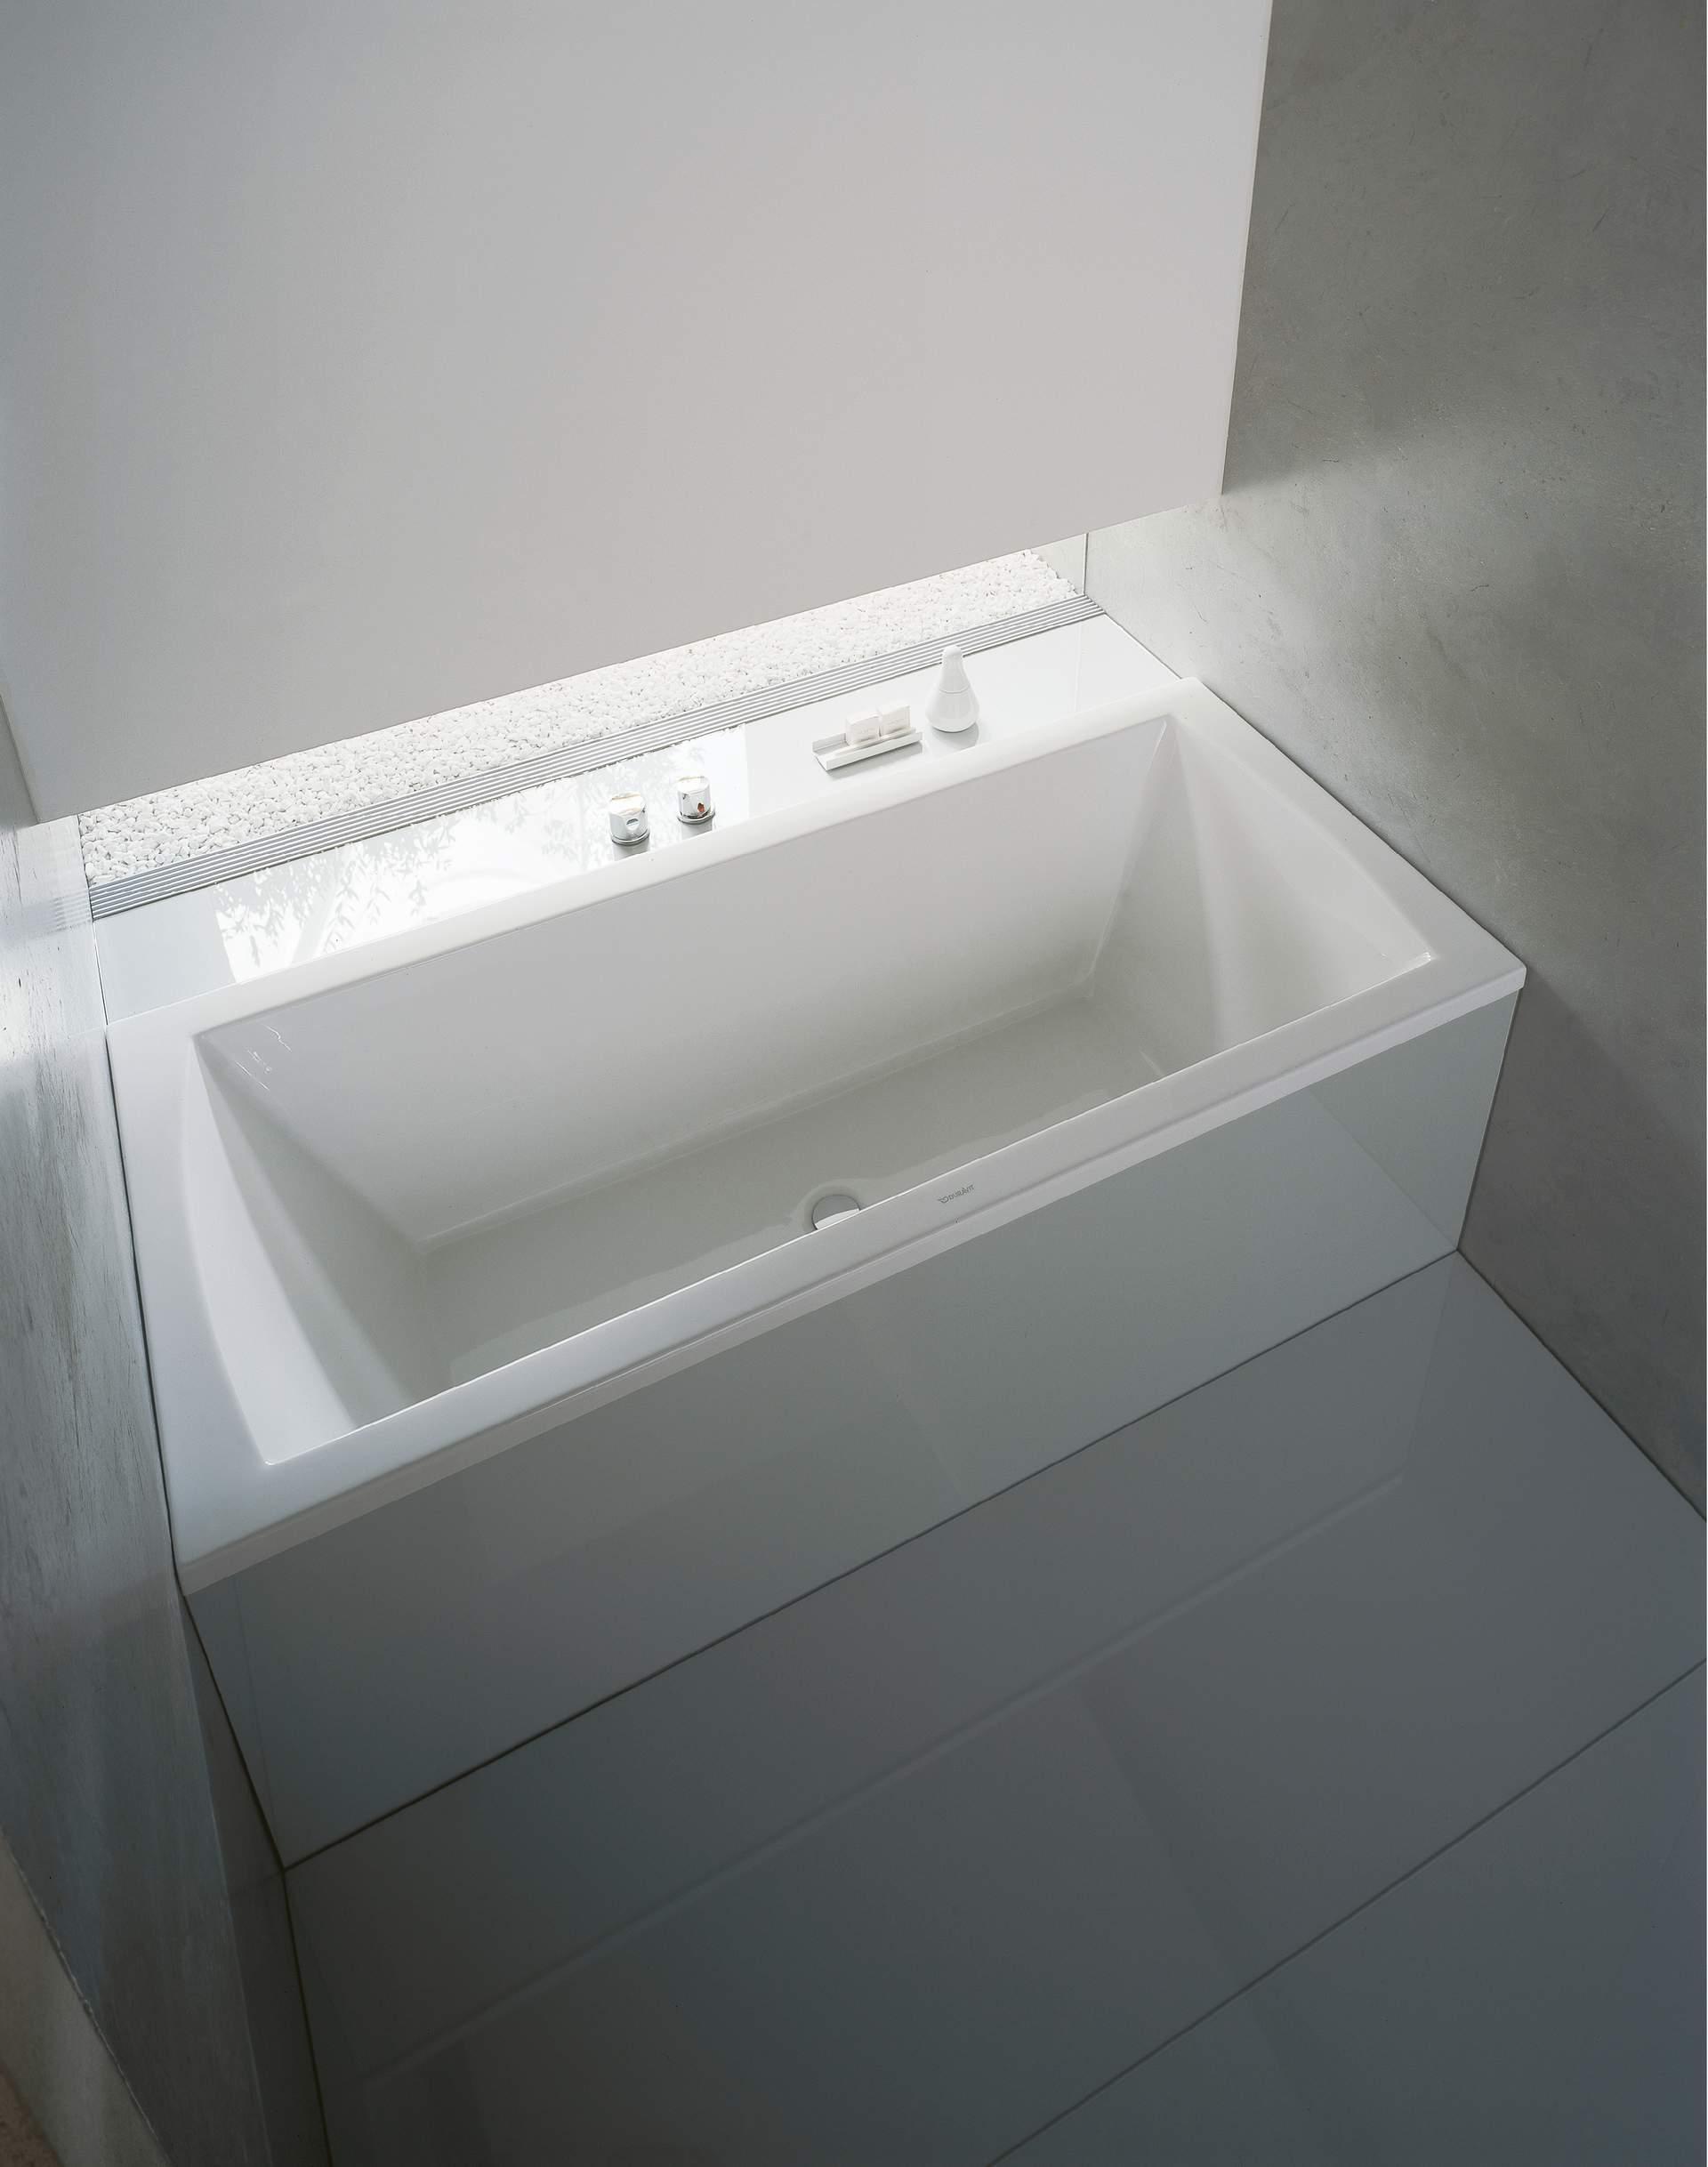 Modern Bathtubs For Your Bathroom | Duravit Bathtub | Duravit